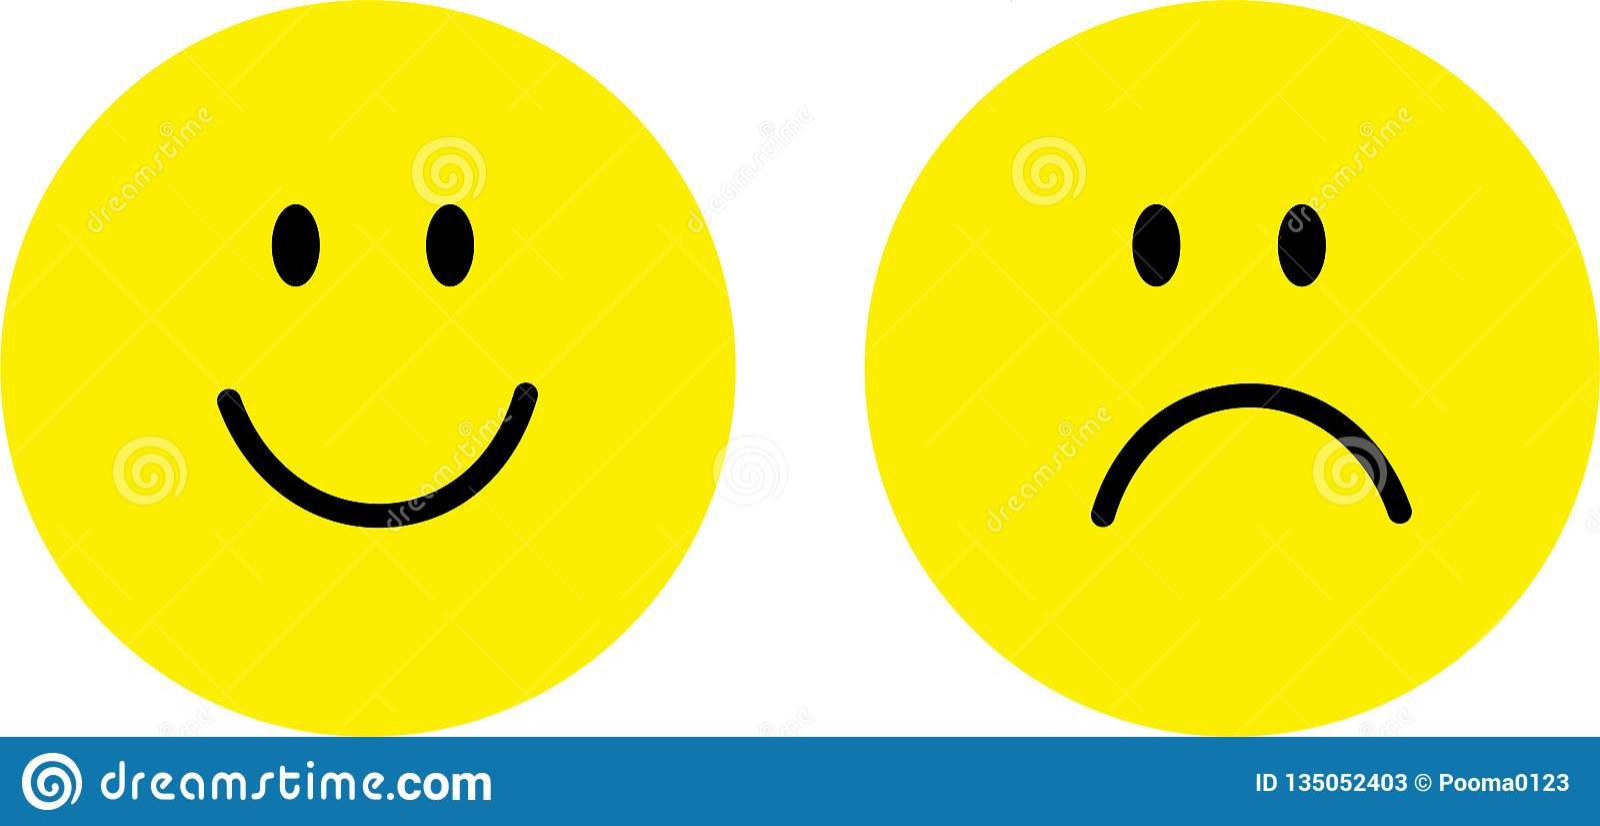 Happy and sad face